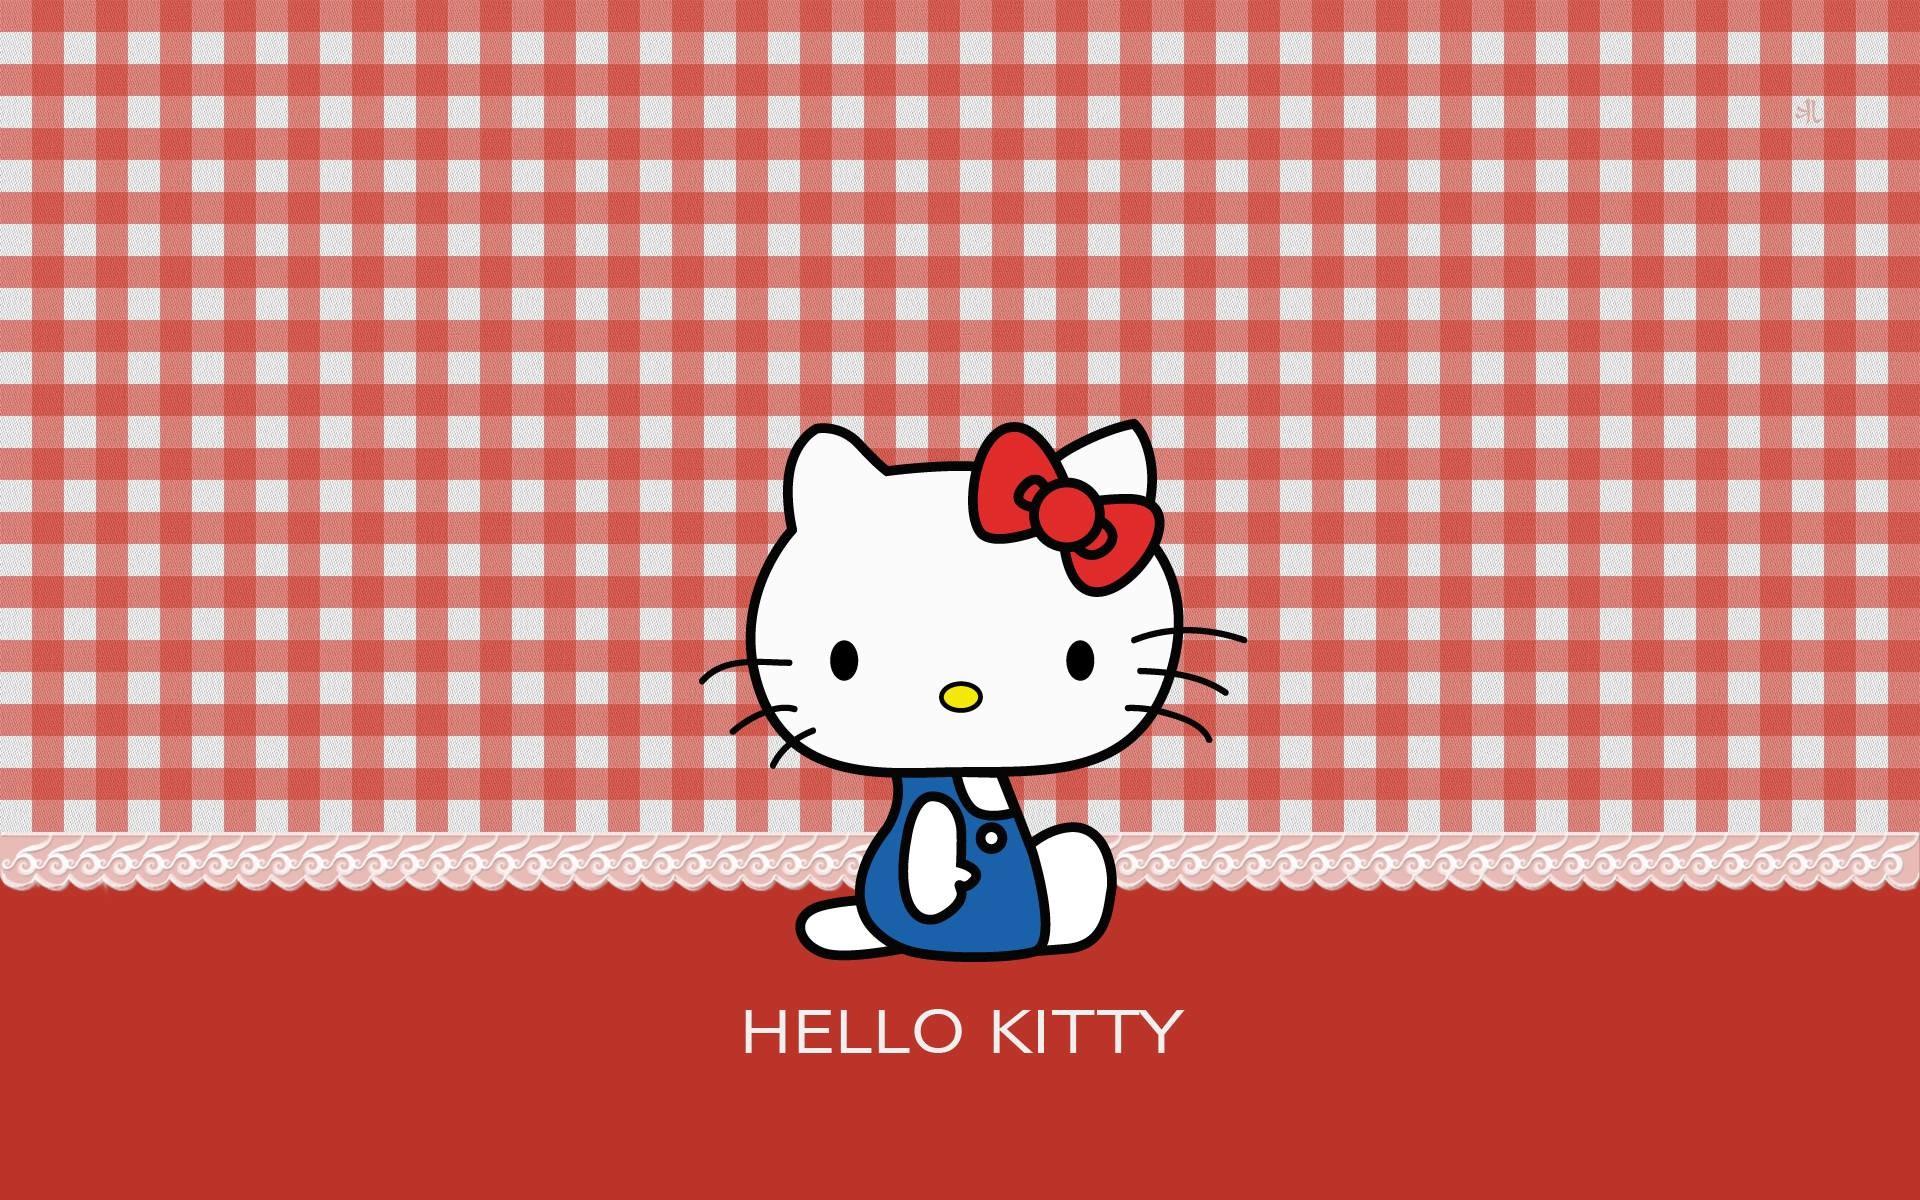 Amazing Wallpaper Hello Kitty Apple - 968605-free-hd-wallpaper-hello-kitty-1920x1200-pictures  Pictures_223488.jpg